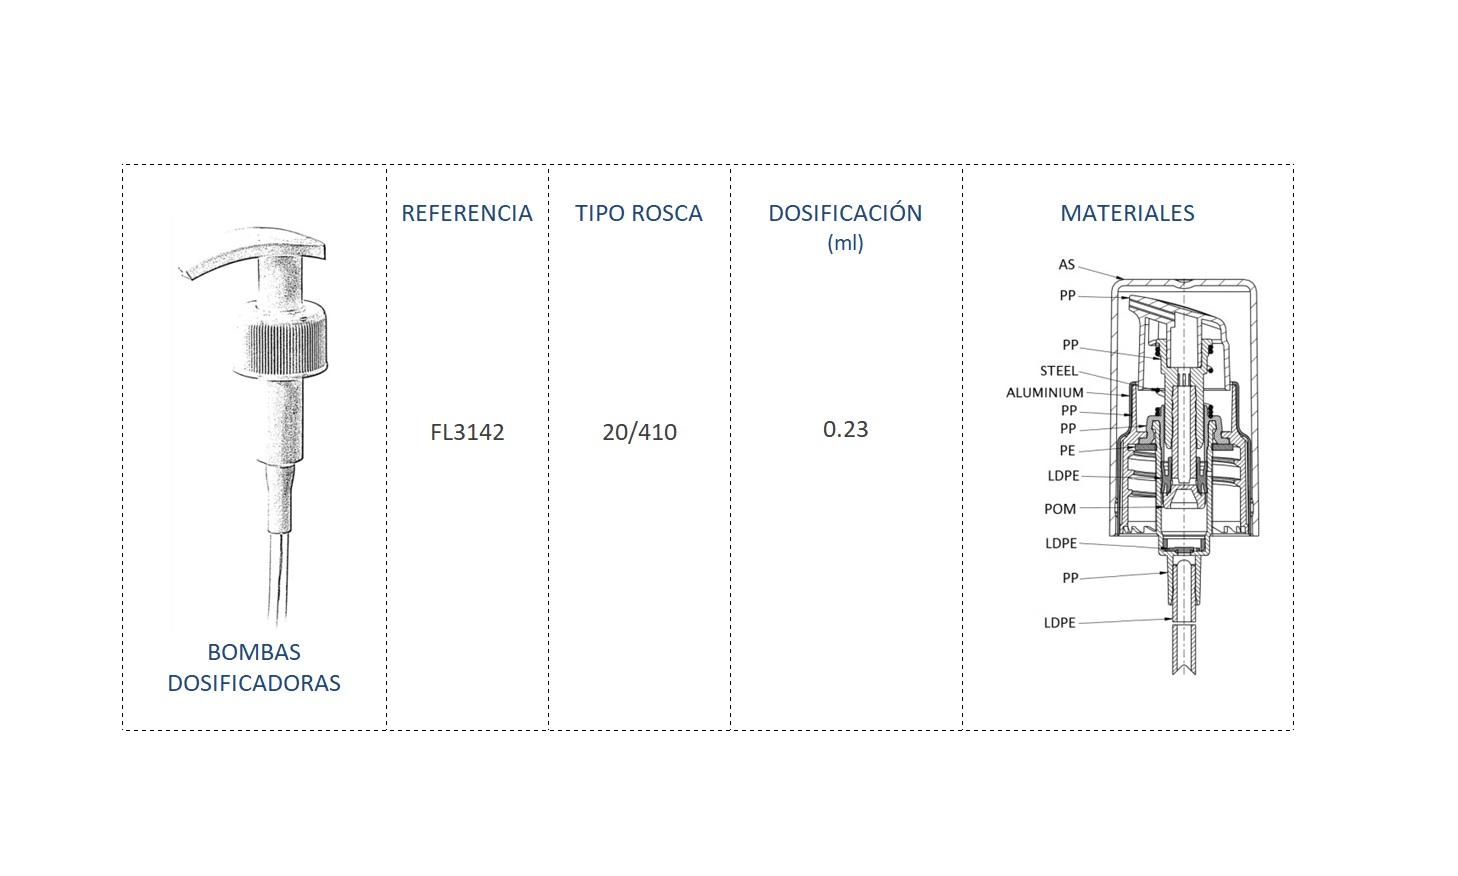 Cuadro de materiales bomba dosificadora FL3142 20/410